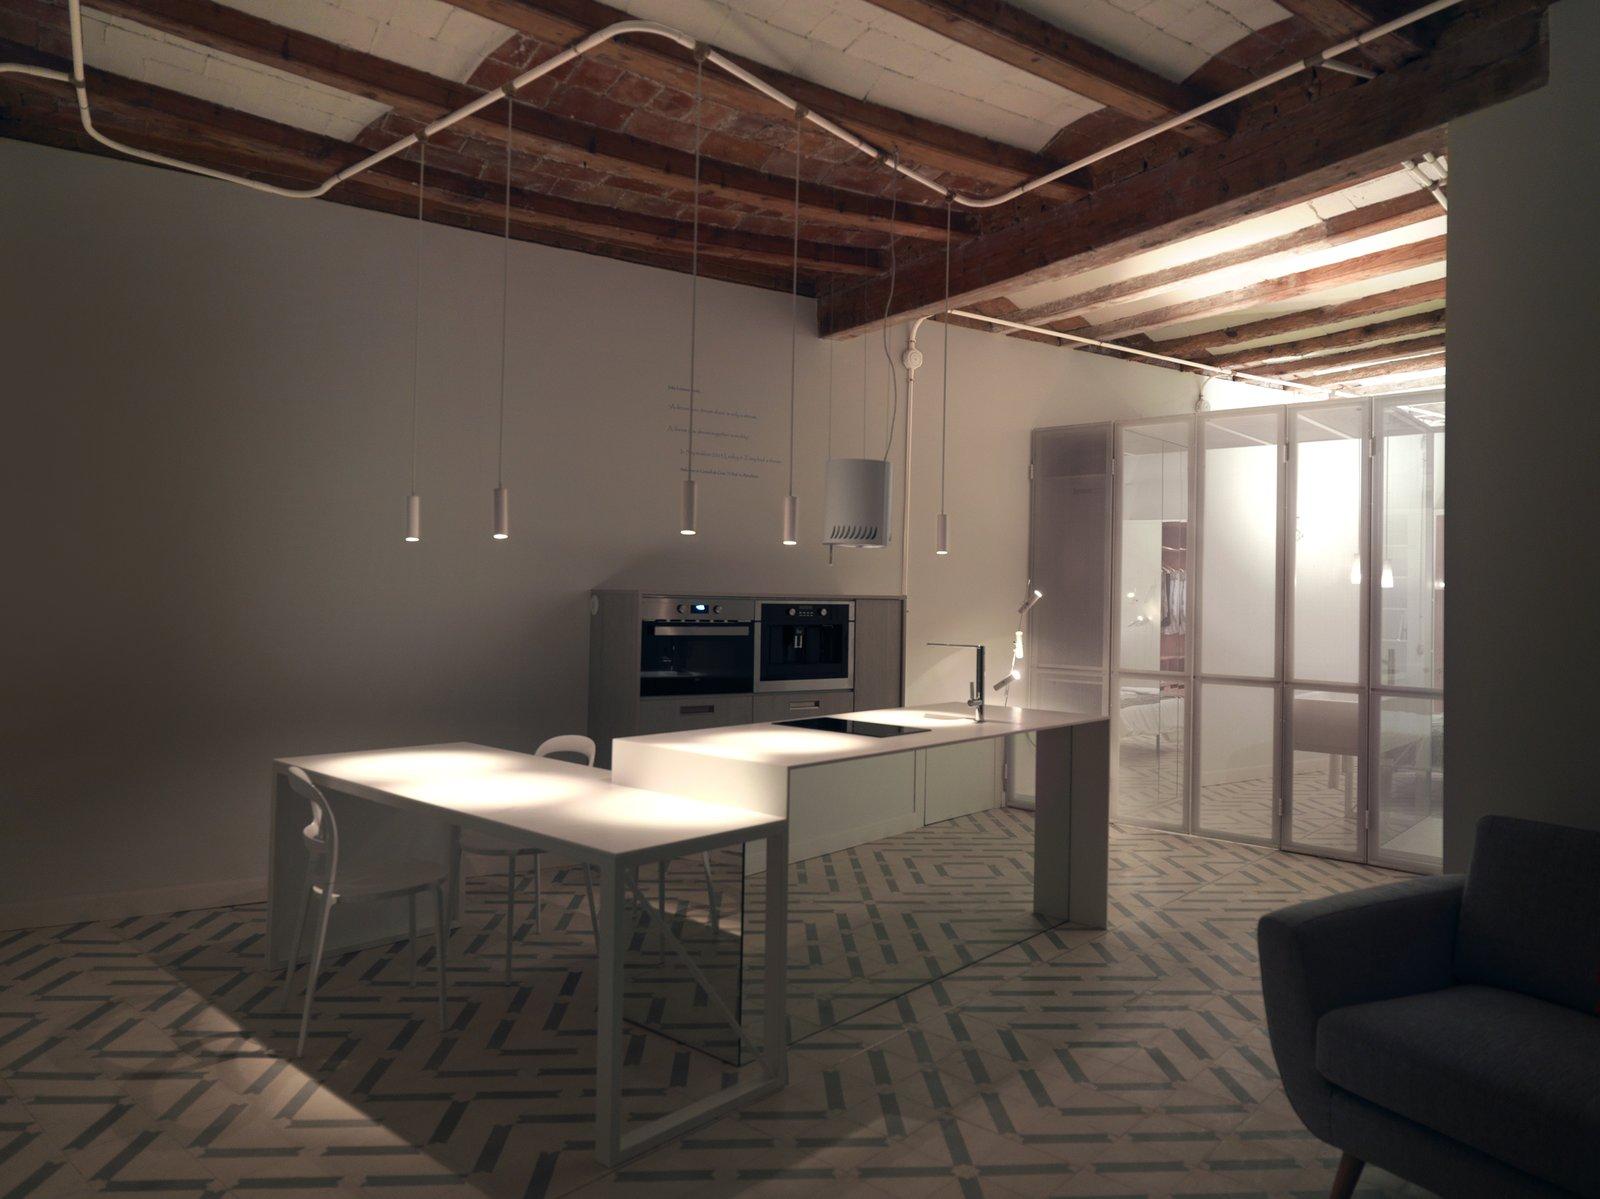 Kitchen, Ceiling Lighting, Pendant Lighting, and Undermount Sink At night  LIGHTSLICE apartment